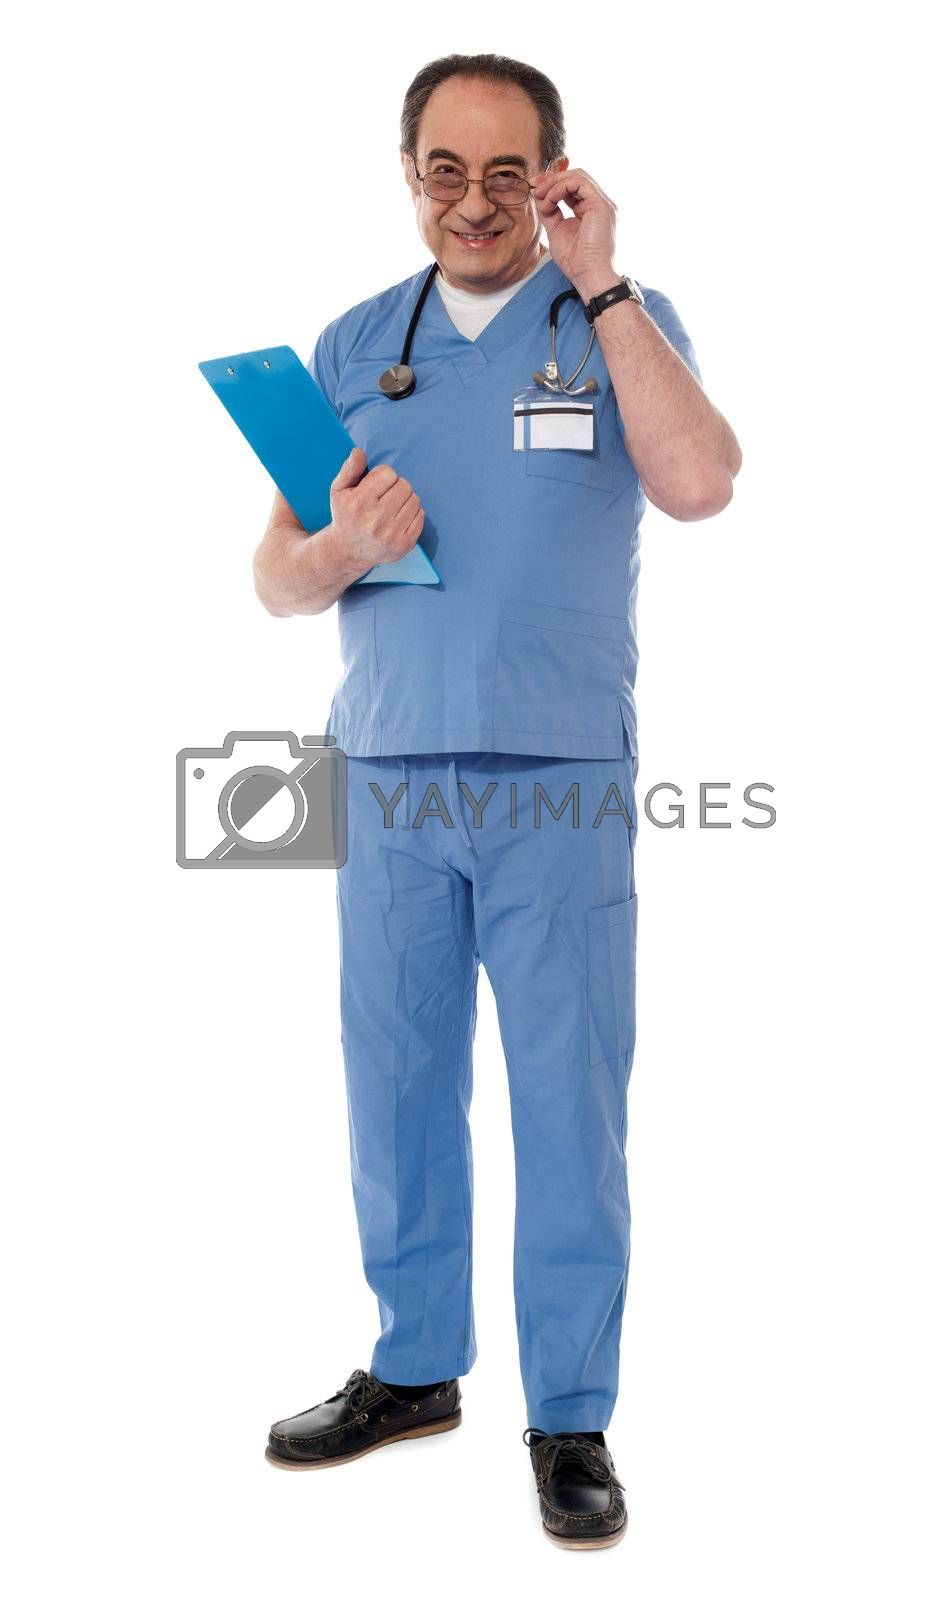 Medical professional looking at camera while holding his eyeglasses